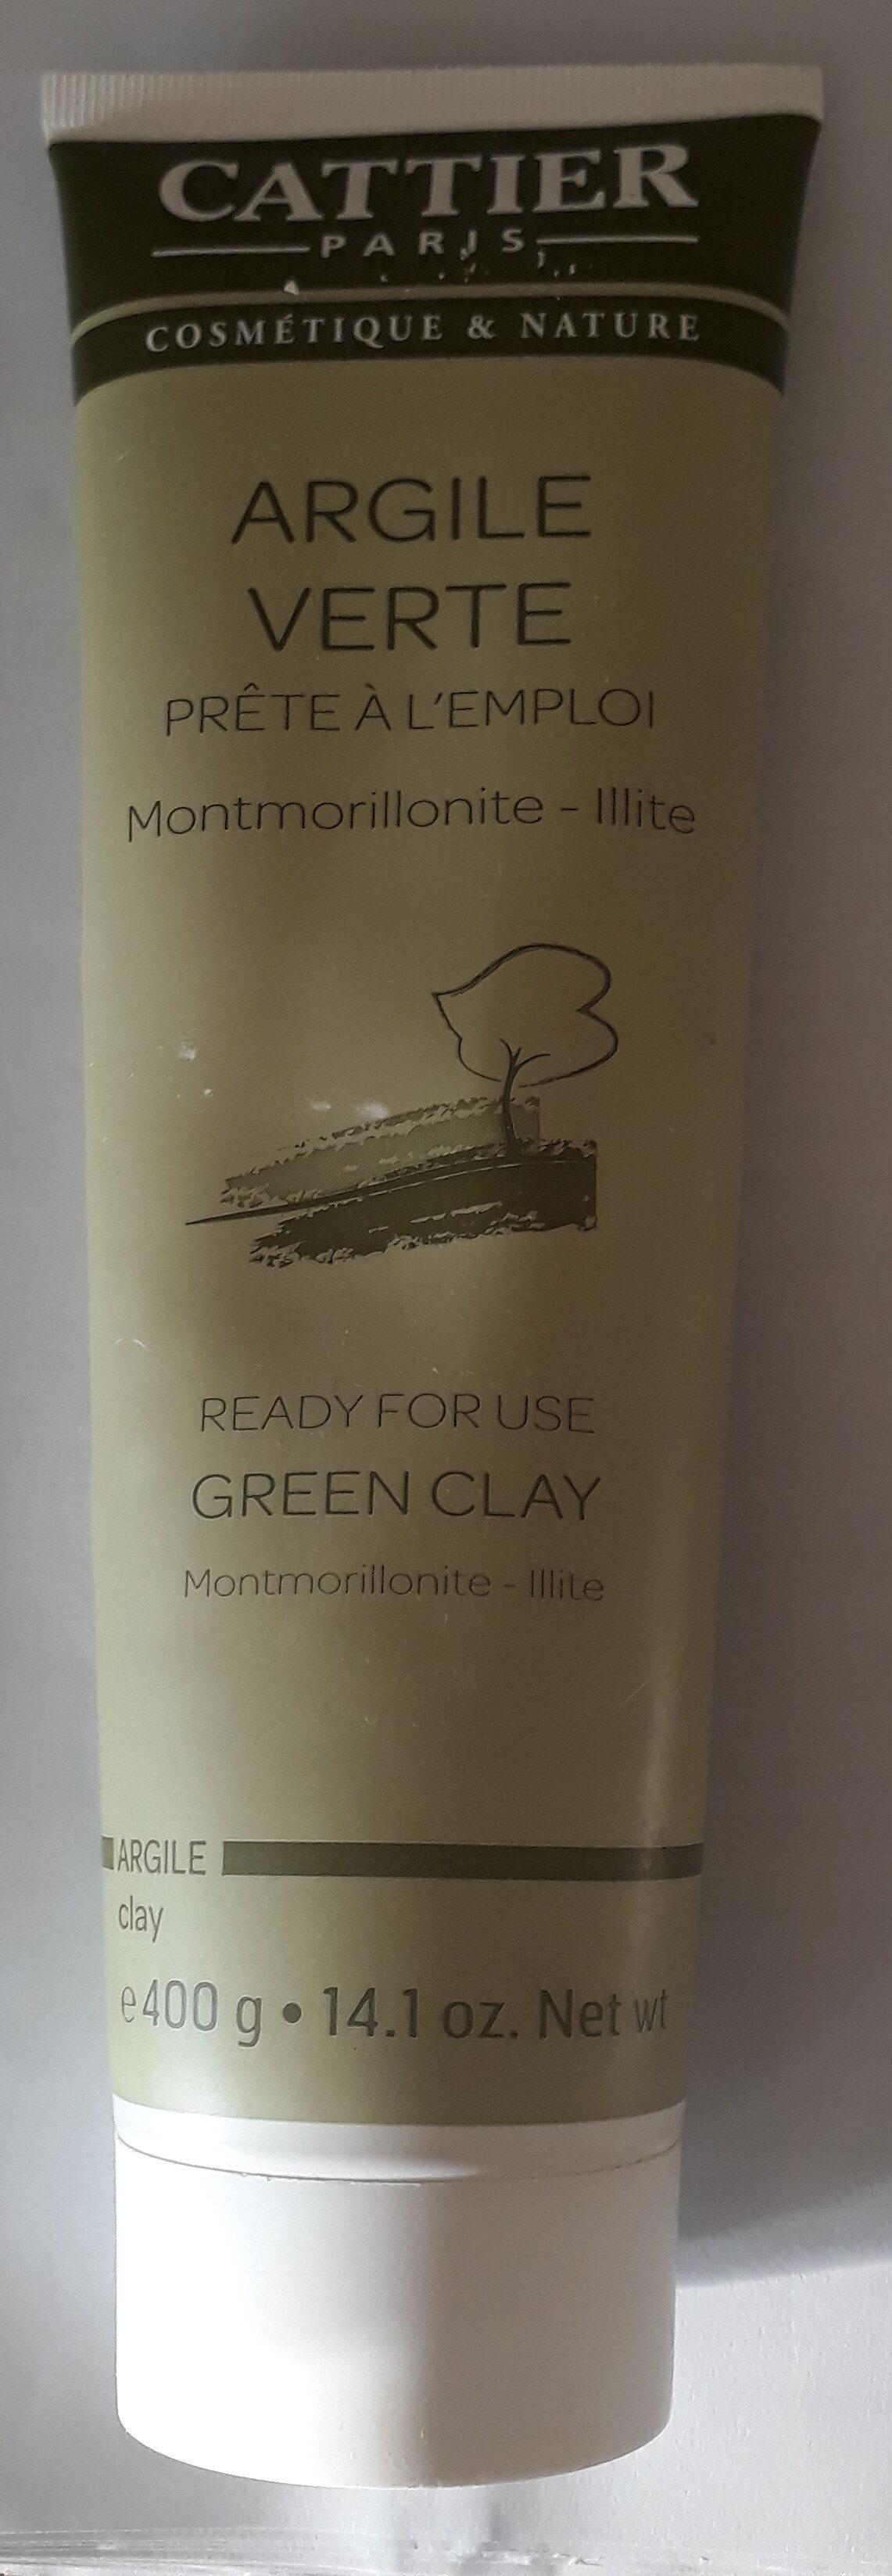 Argile verte Prête à l'emploi Montmorillonite - Illite - Product - fr